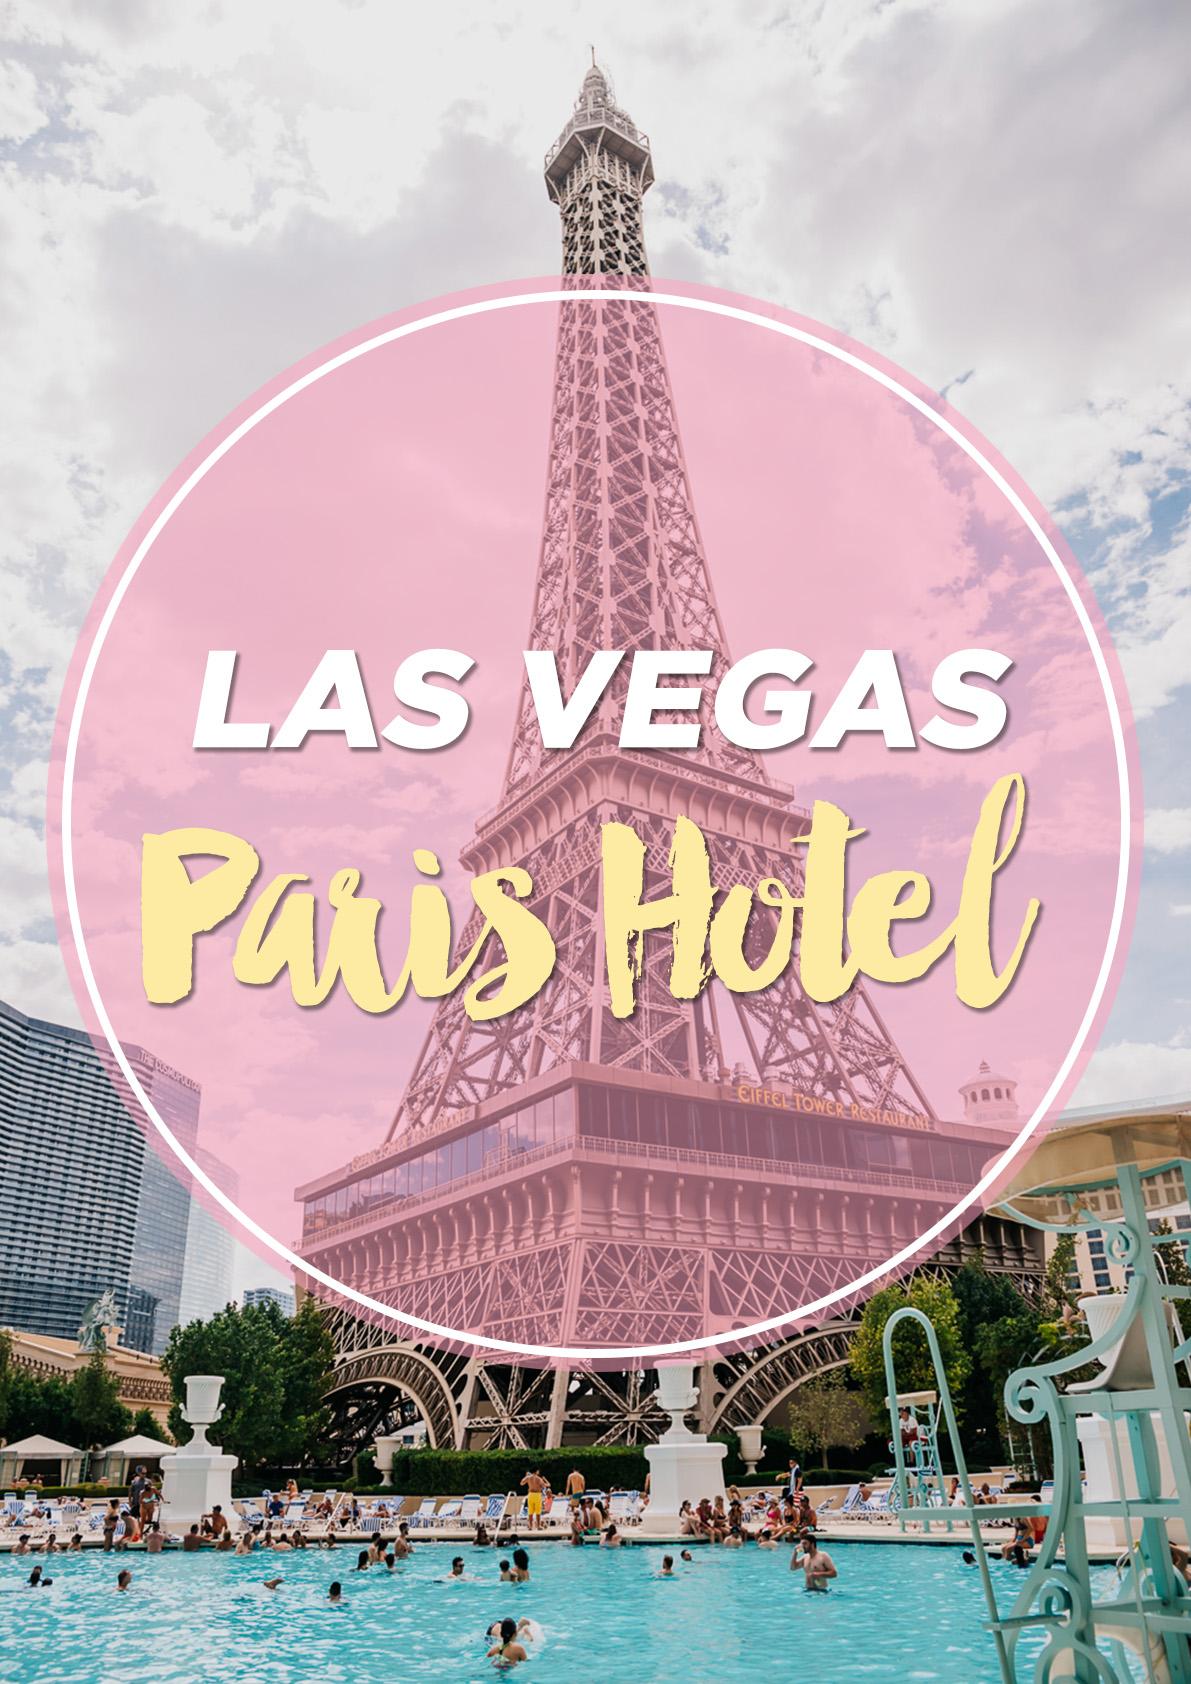 Paris Hotel Vegas Pinterest wwww.thetravelpockets.com